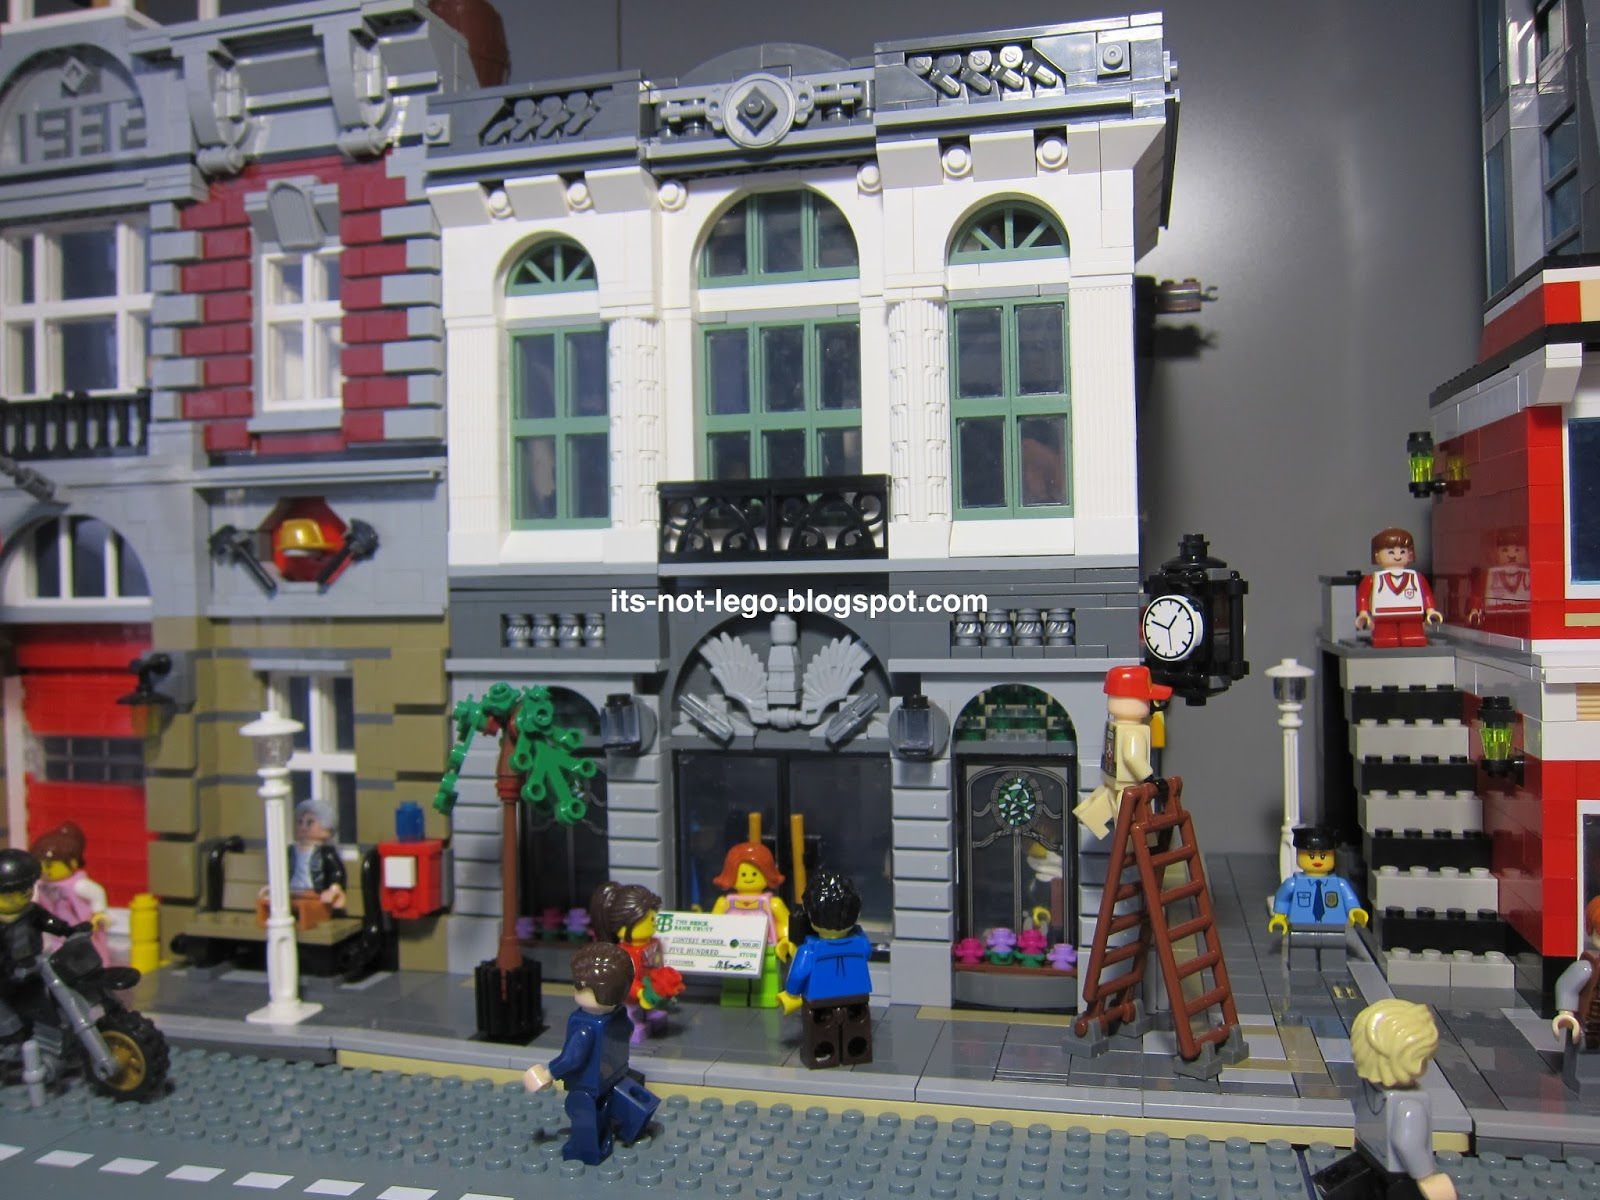 It's Not Lego!: Lepin 15001 Fake Lego Brick Bank Modular Building